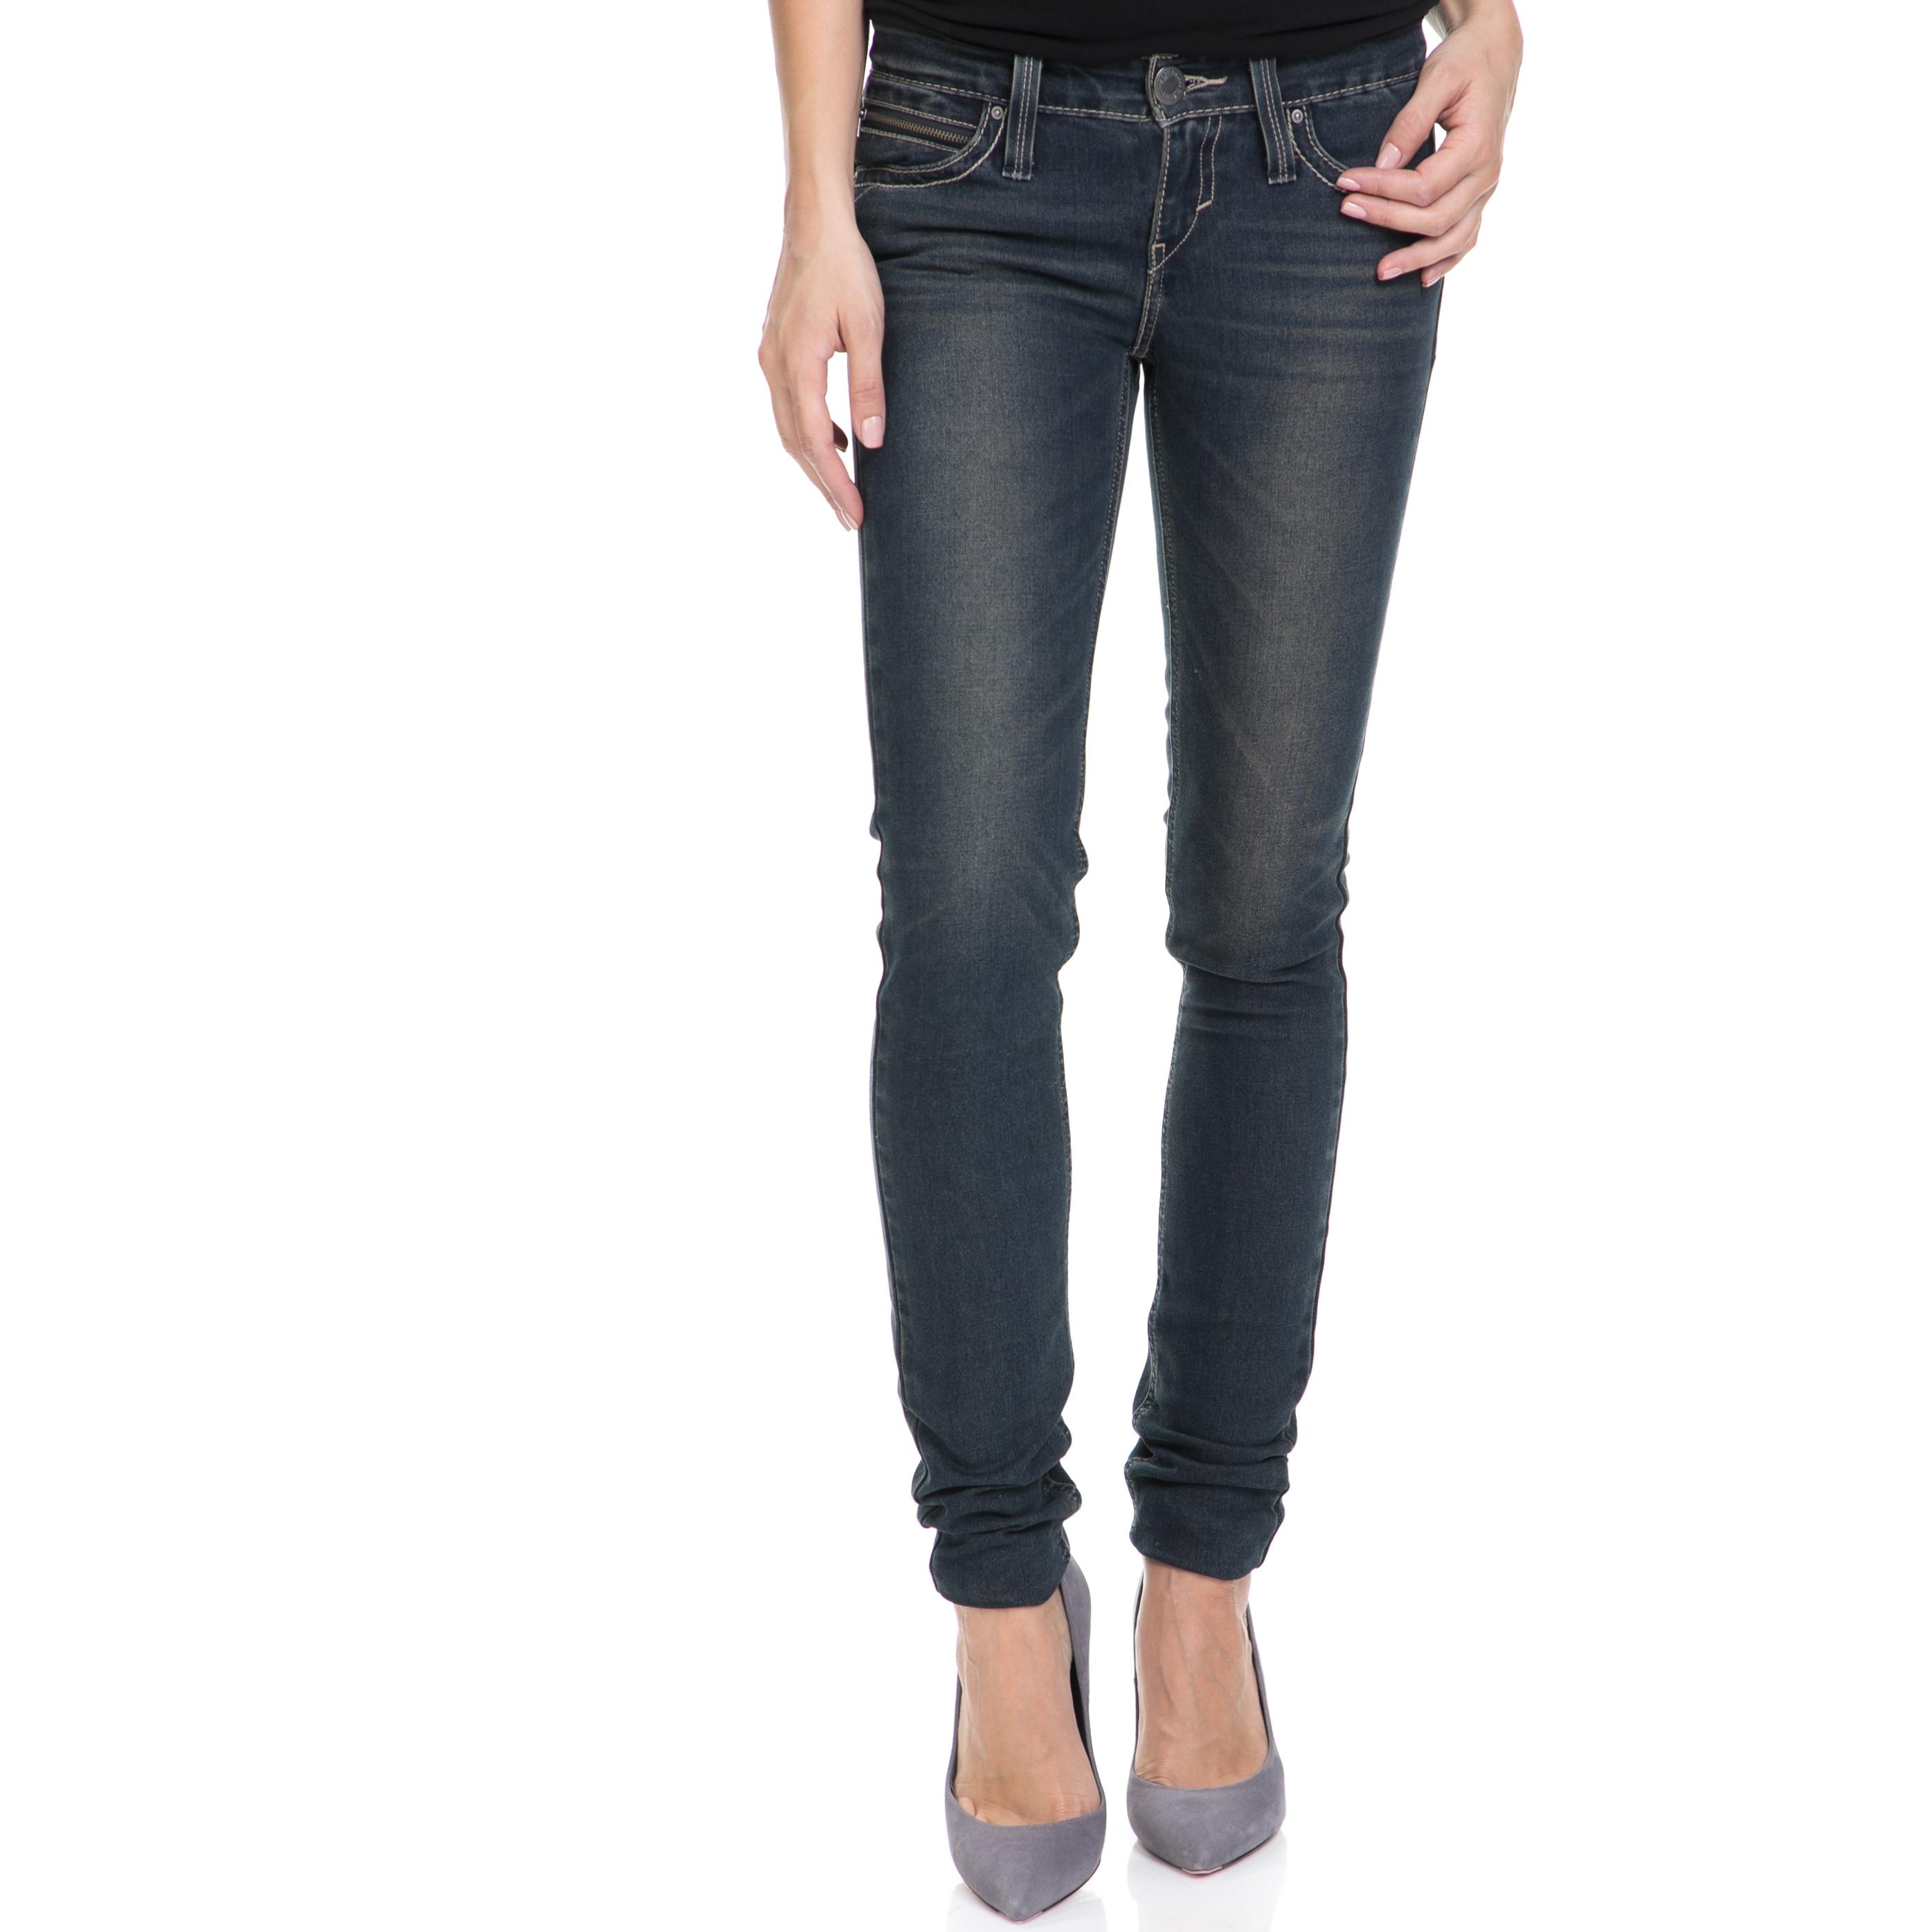 LEVI'S – Γυναικείο τζιν παντελόνι REVEL LOW DC SKINNY LEVI'S μπλε